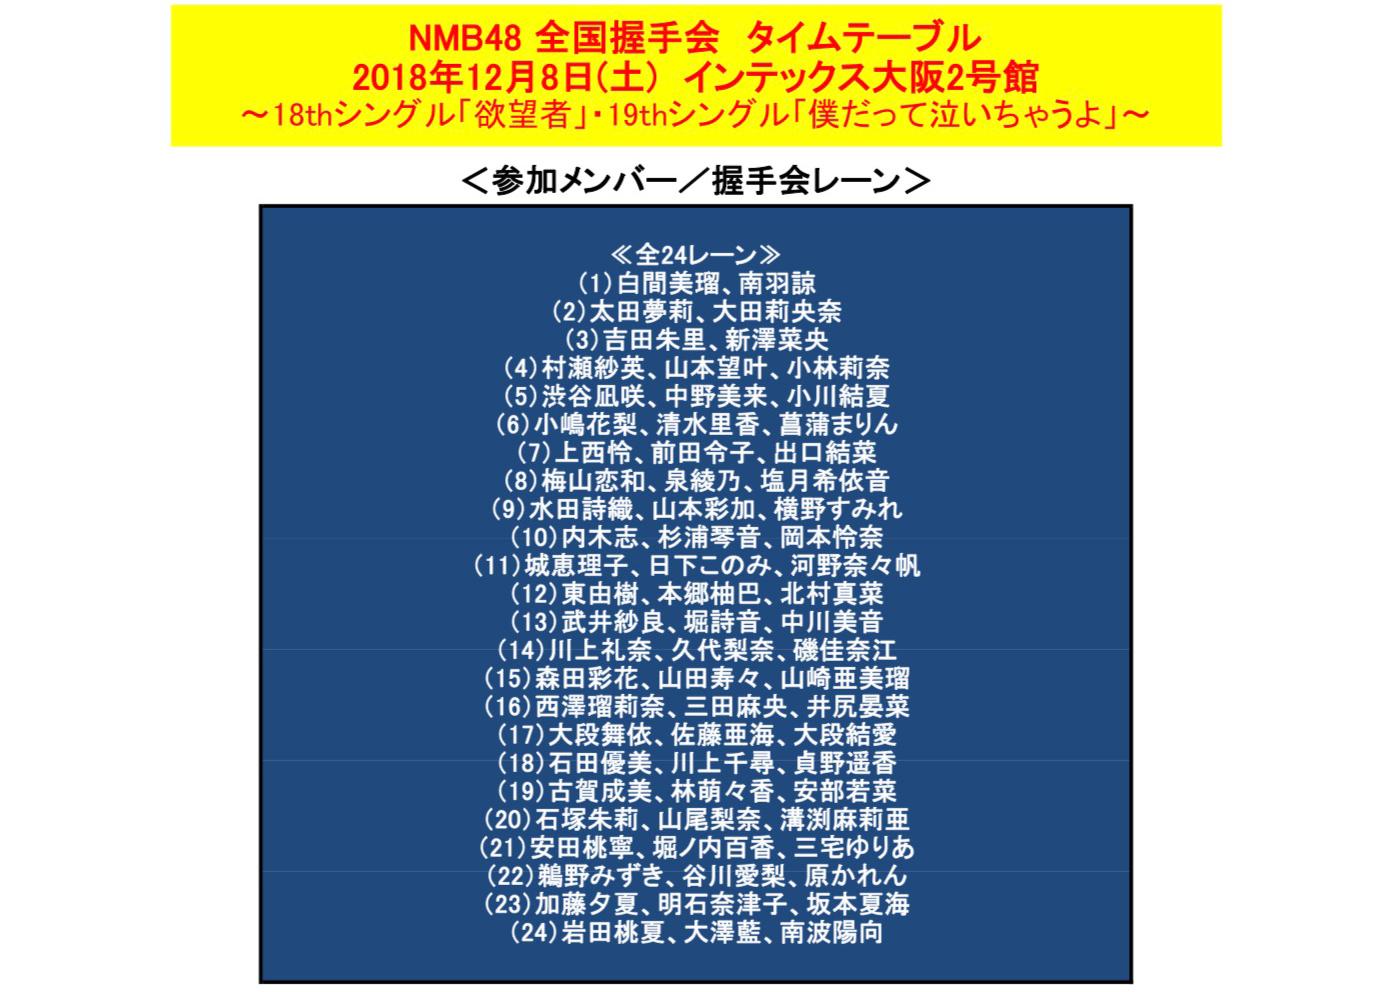 【NMB48】12月8日インテックス大阪開催の「欲望者」「僕だって泣いちゃうよ」全握概要